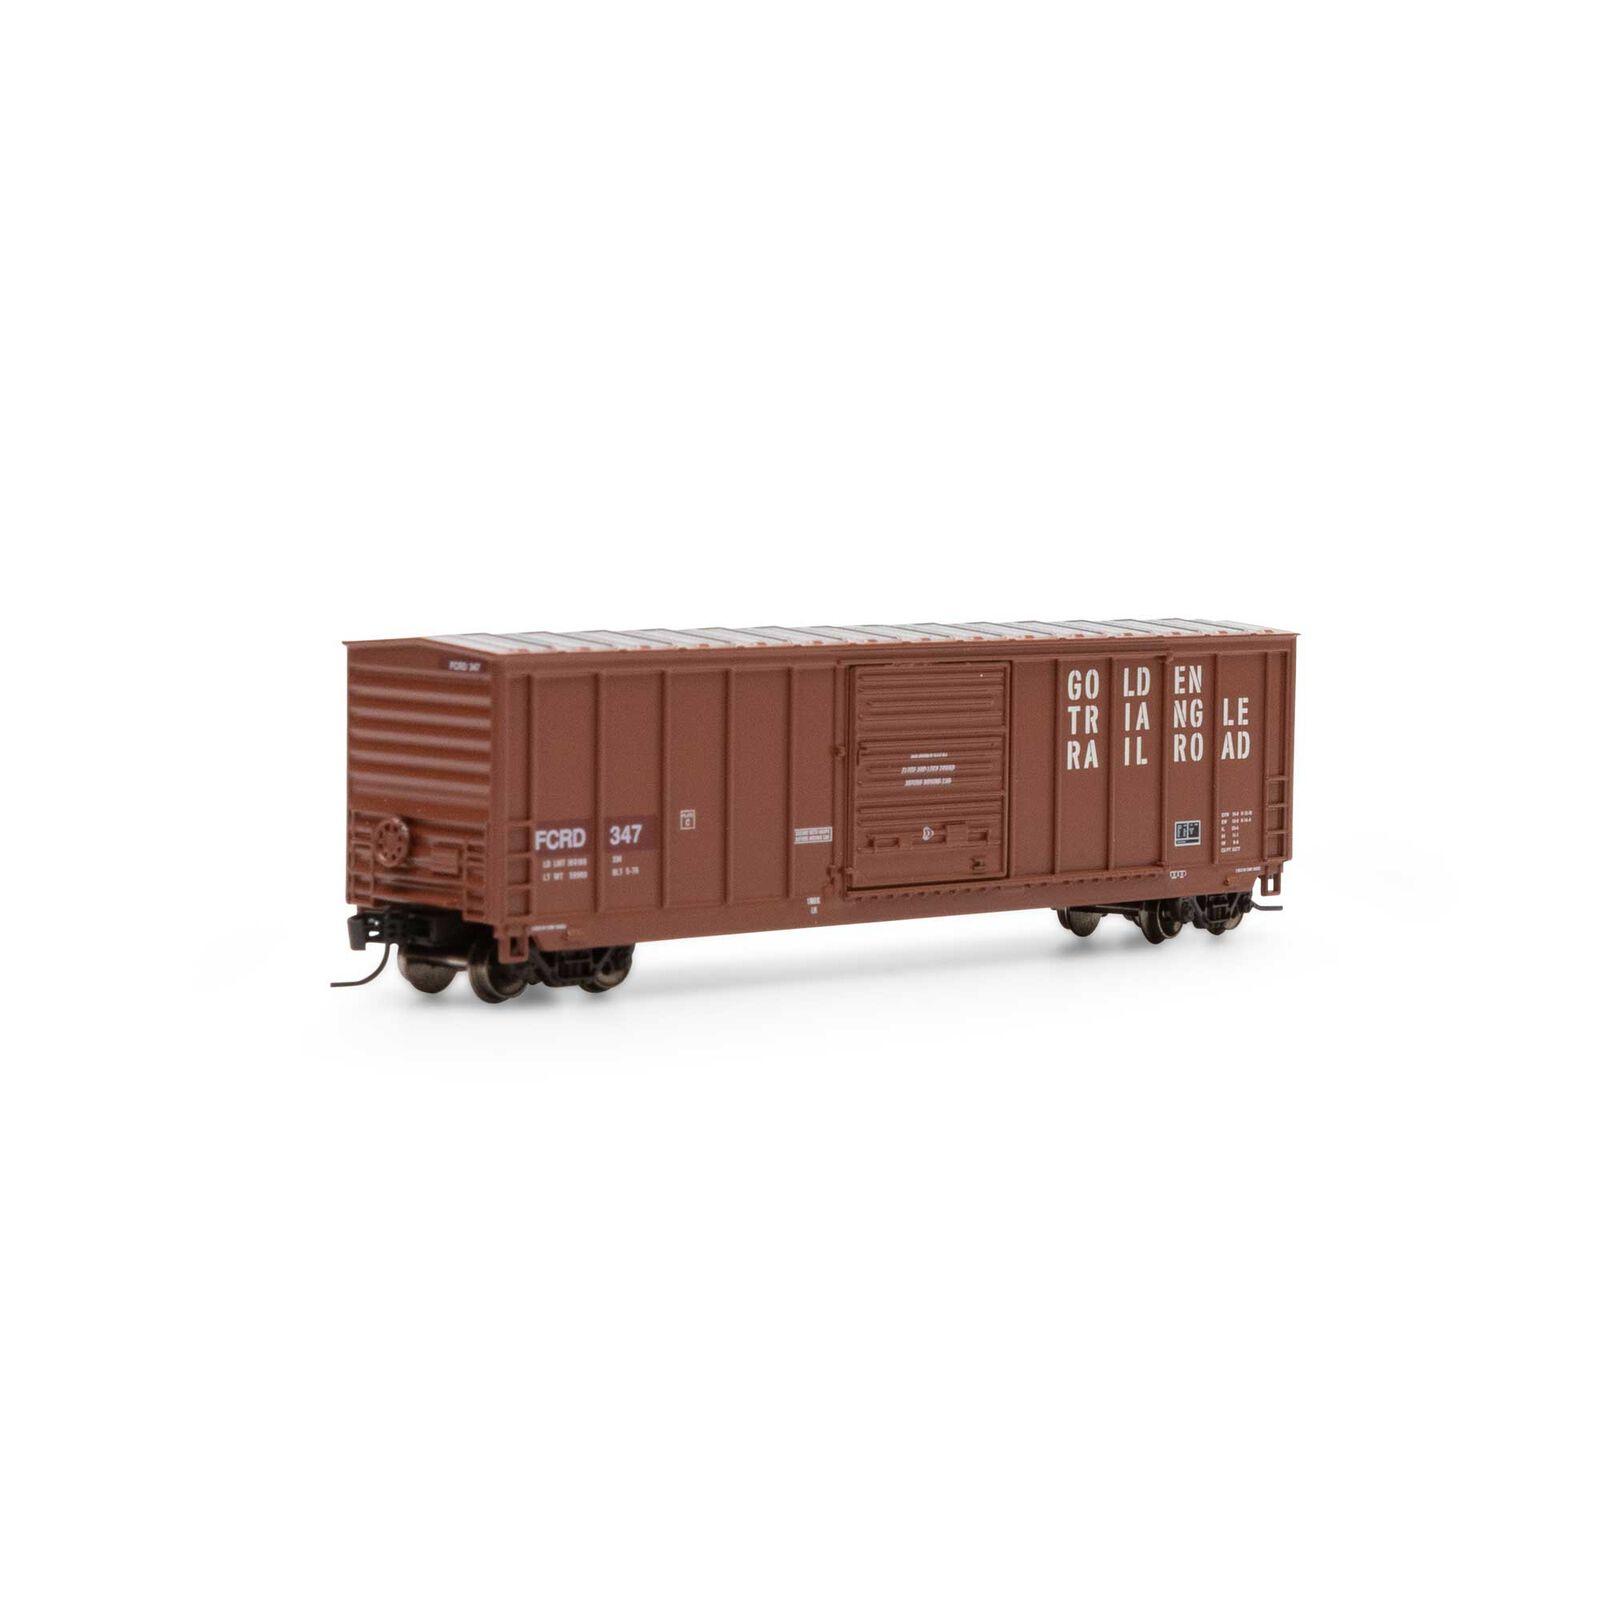 N 50' PS 5277 Box, FCRD #347